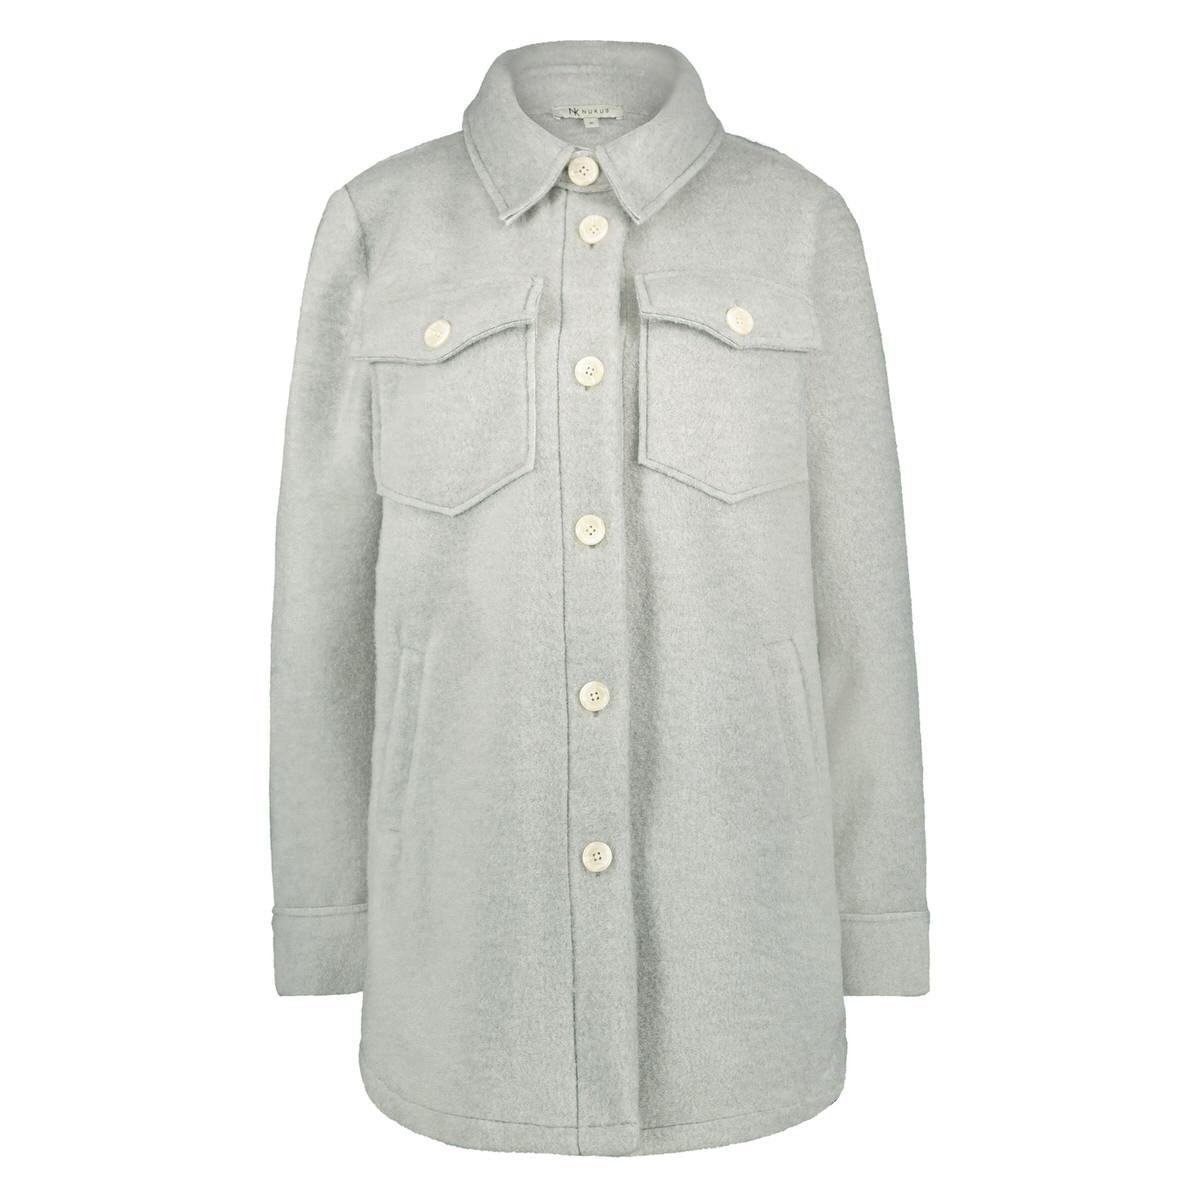 Mindy Coat - Light grey